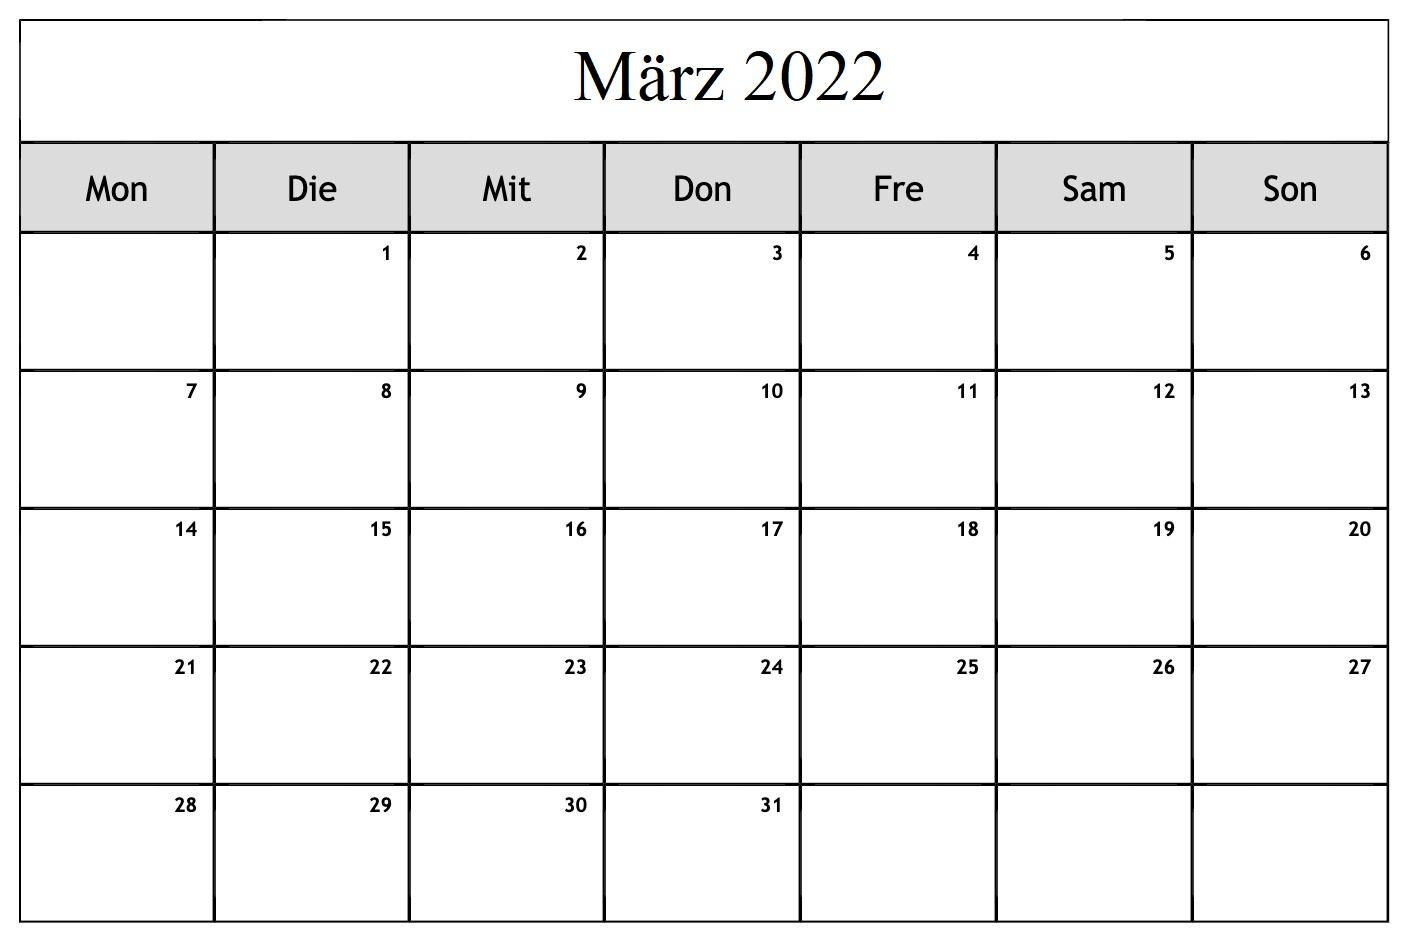 März 2022 Kalender